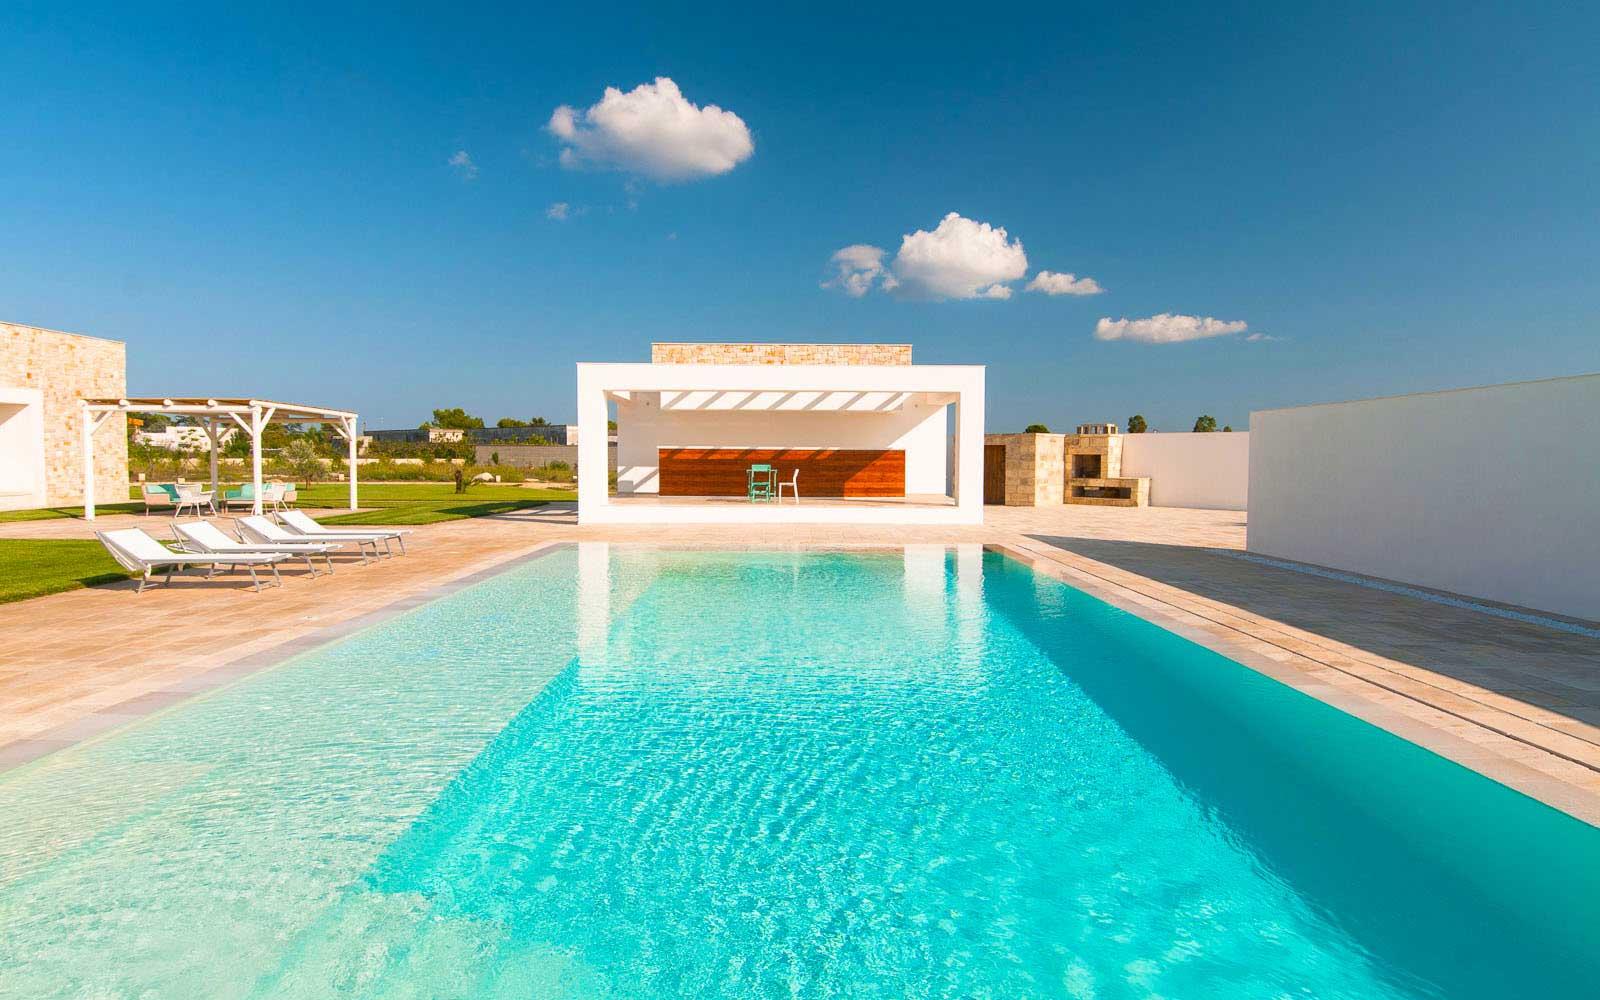 SYS Piscine prospettiva piscina